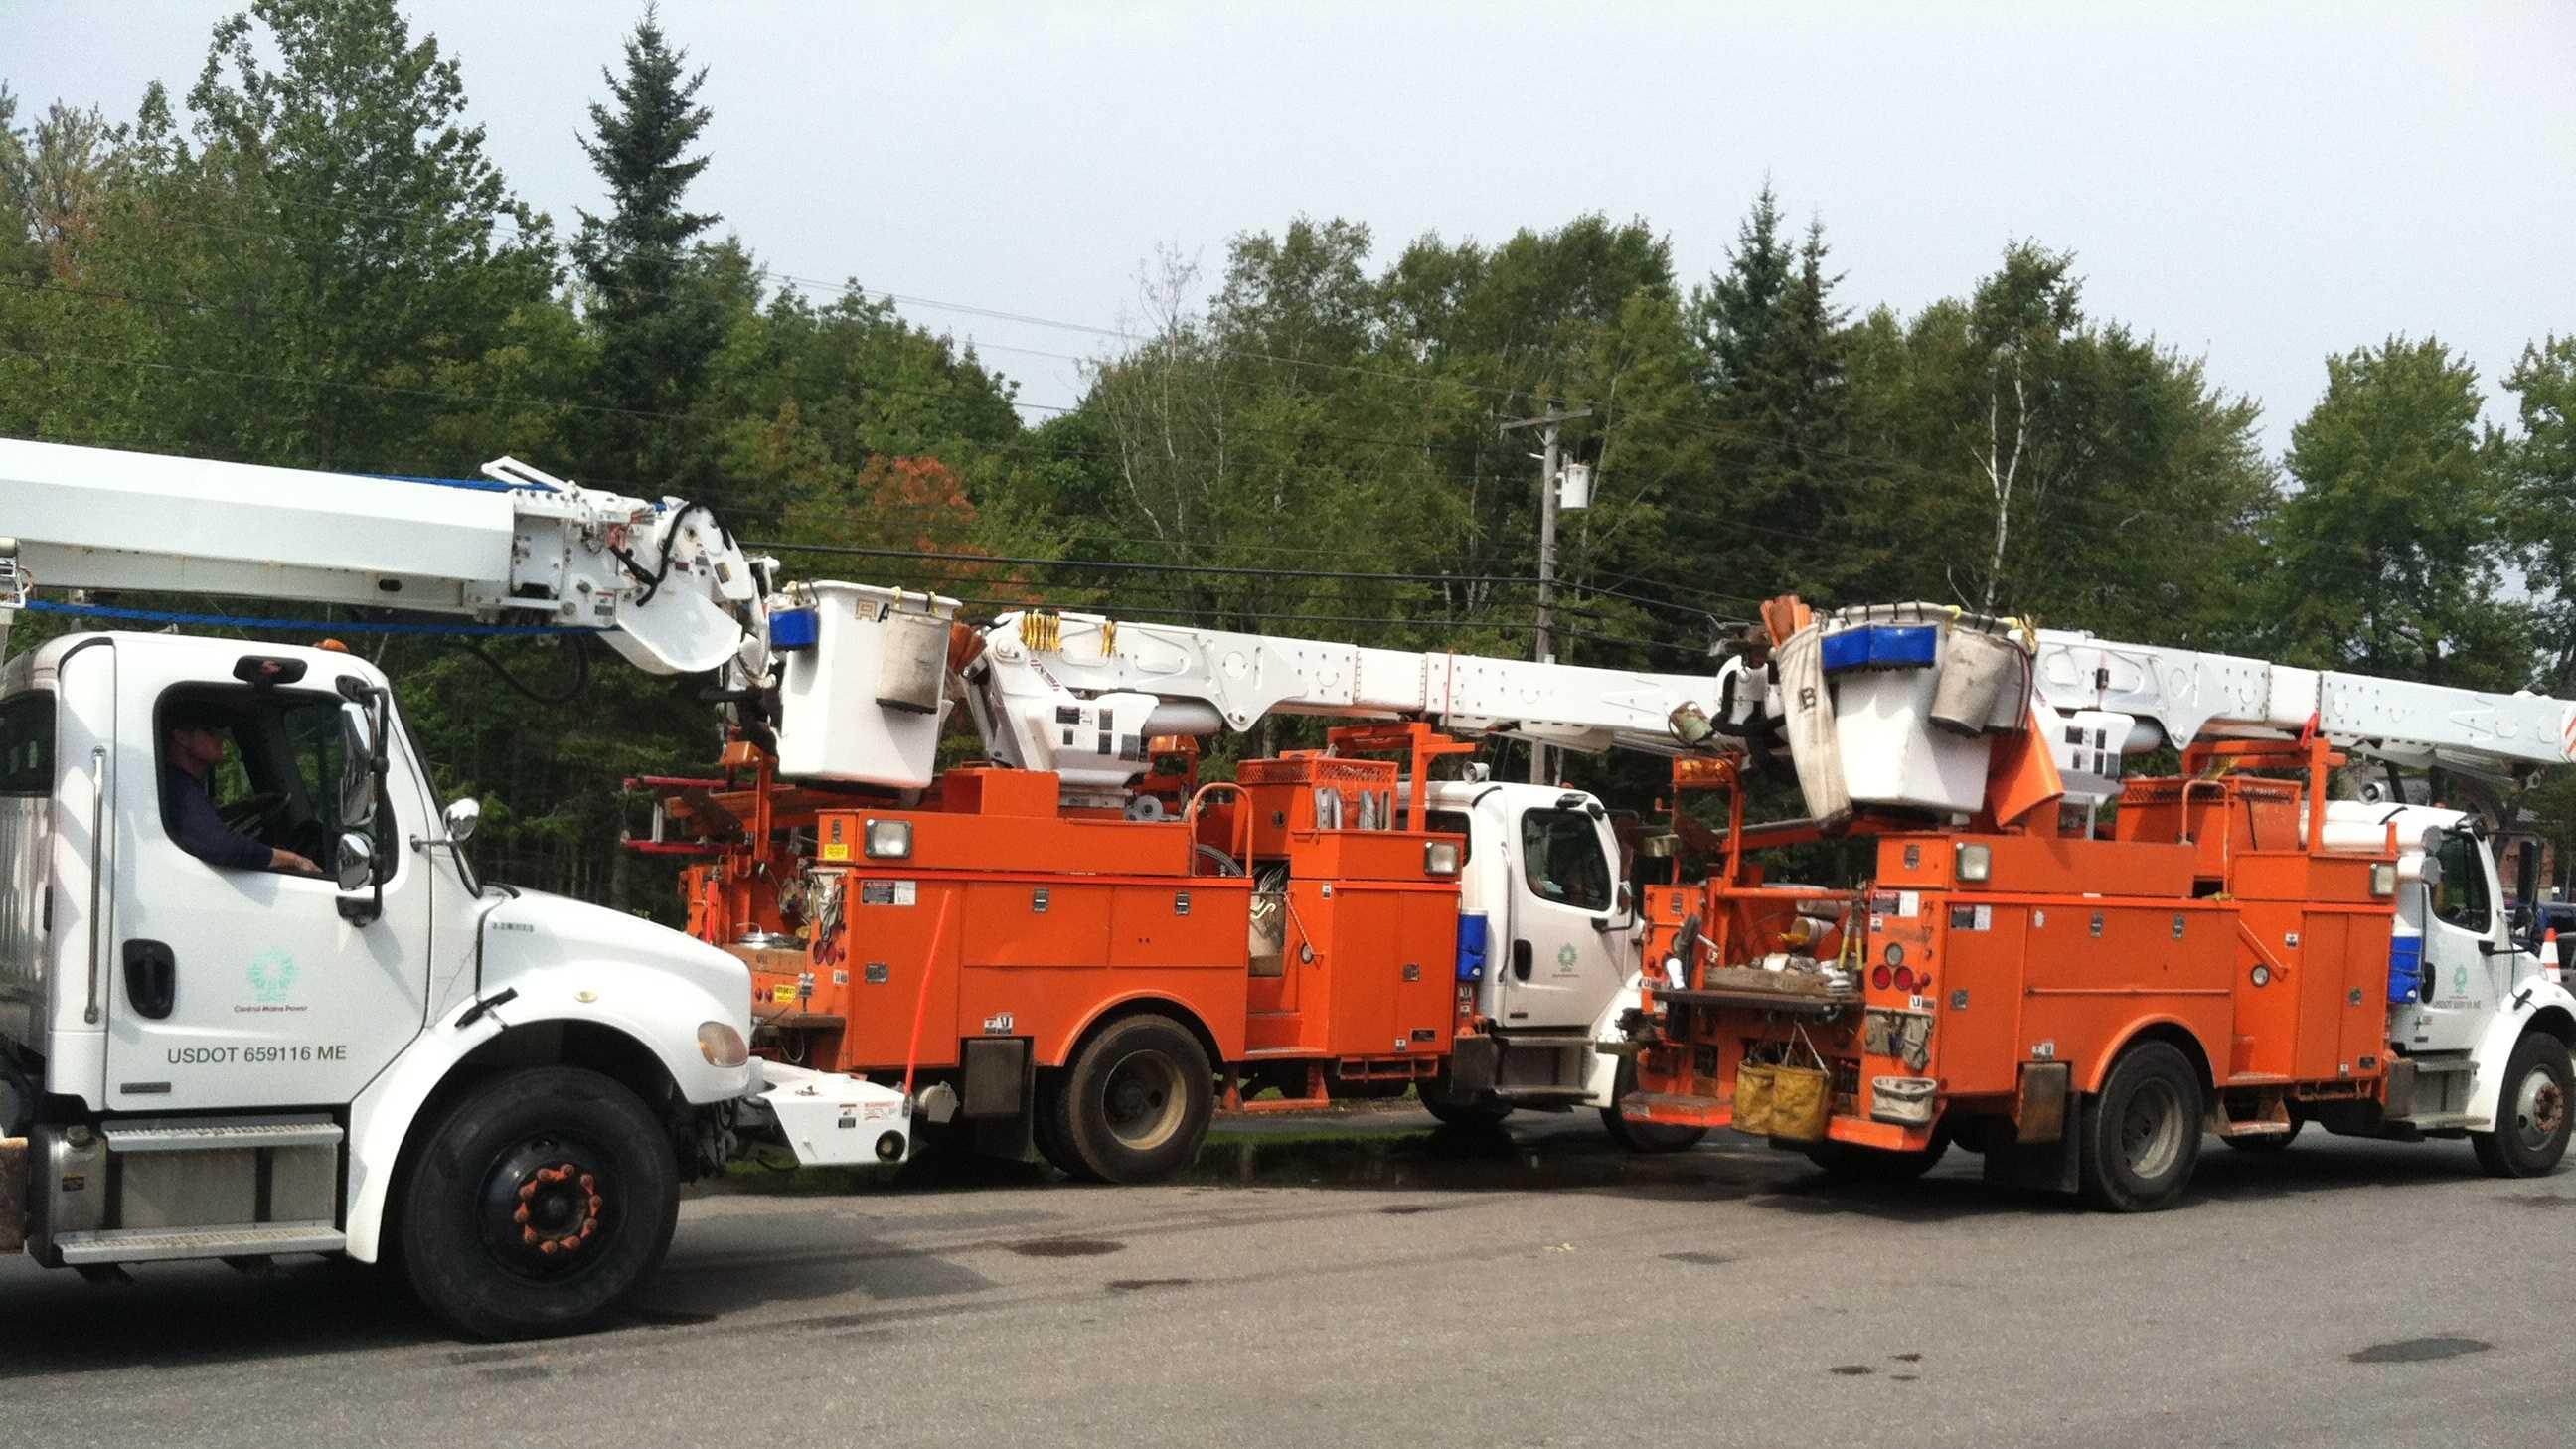 Central Maine Power trucks